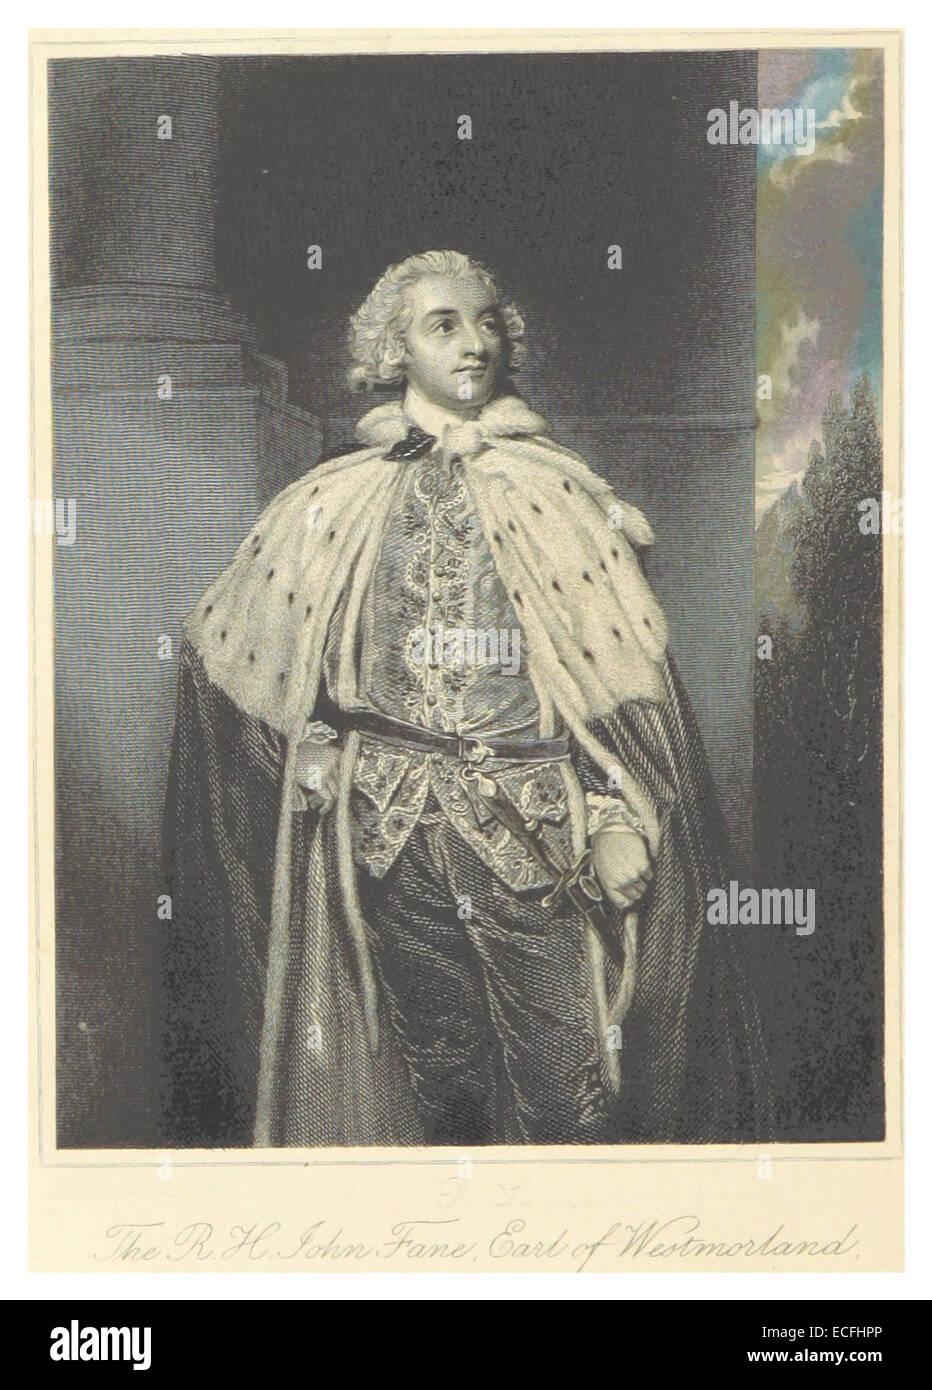 MAXWELL(1845) p352 John Fane, comte de Westmoreland Banque D'Images